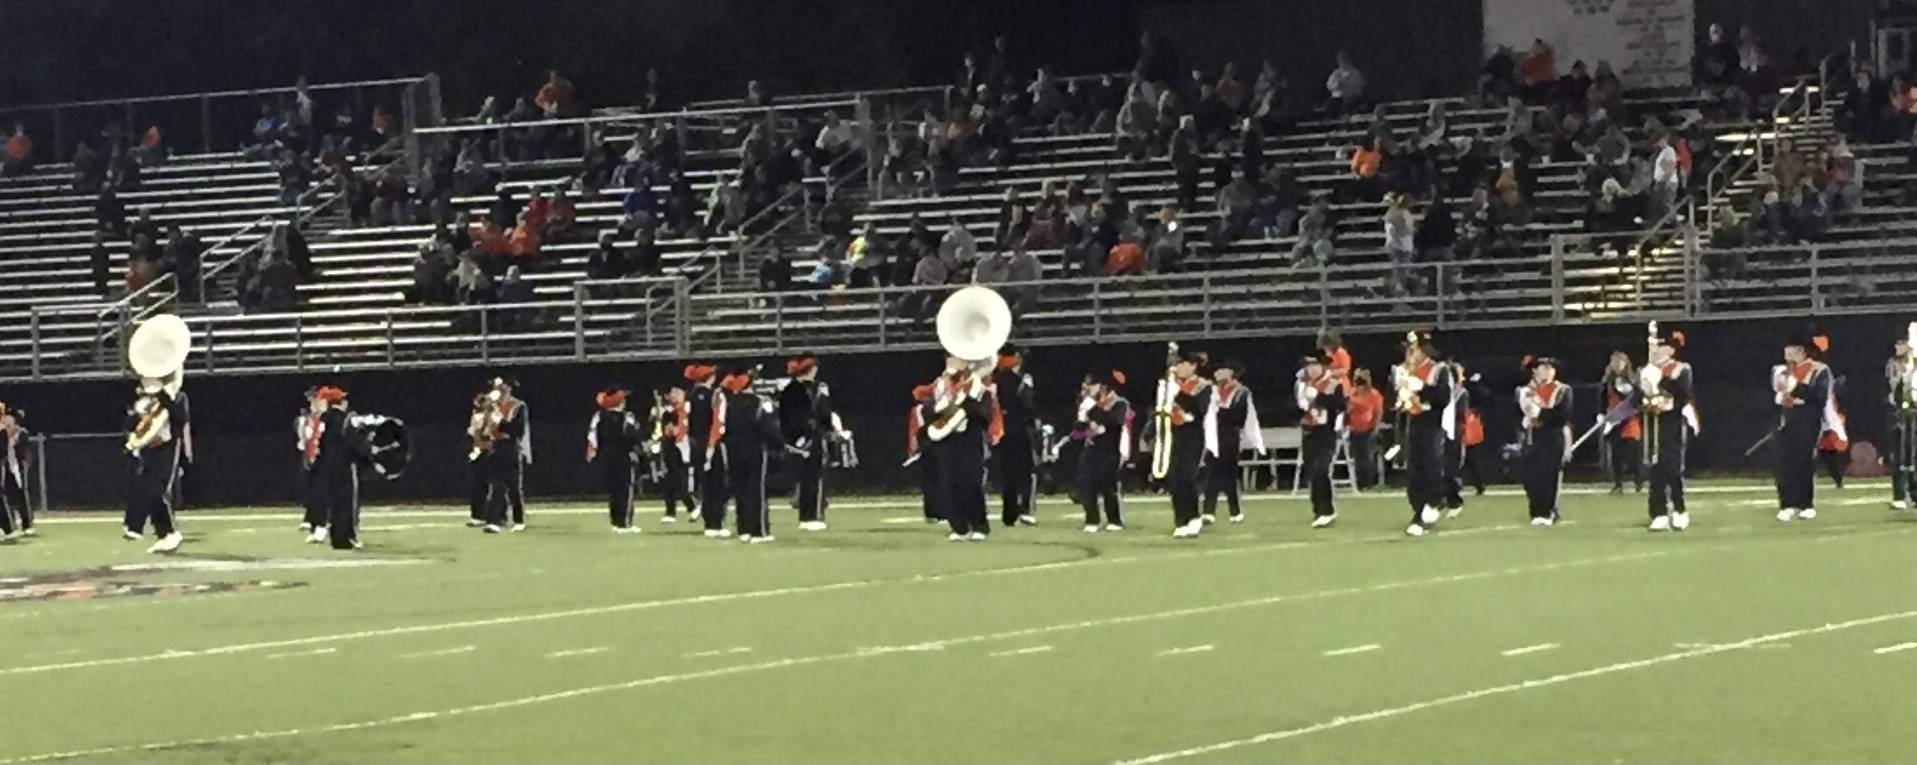 Marching Band performing at home vs Westfall